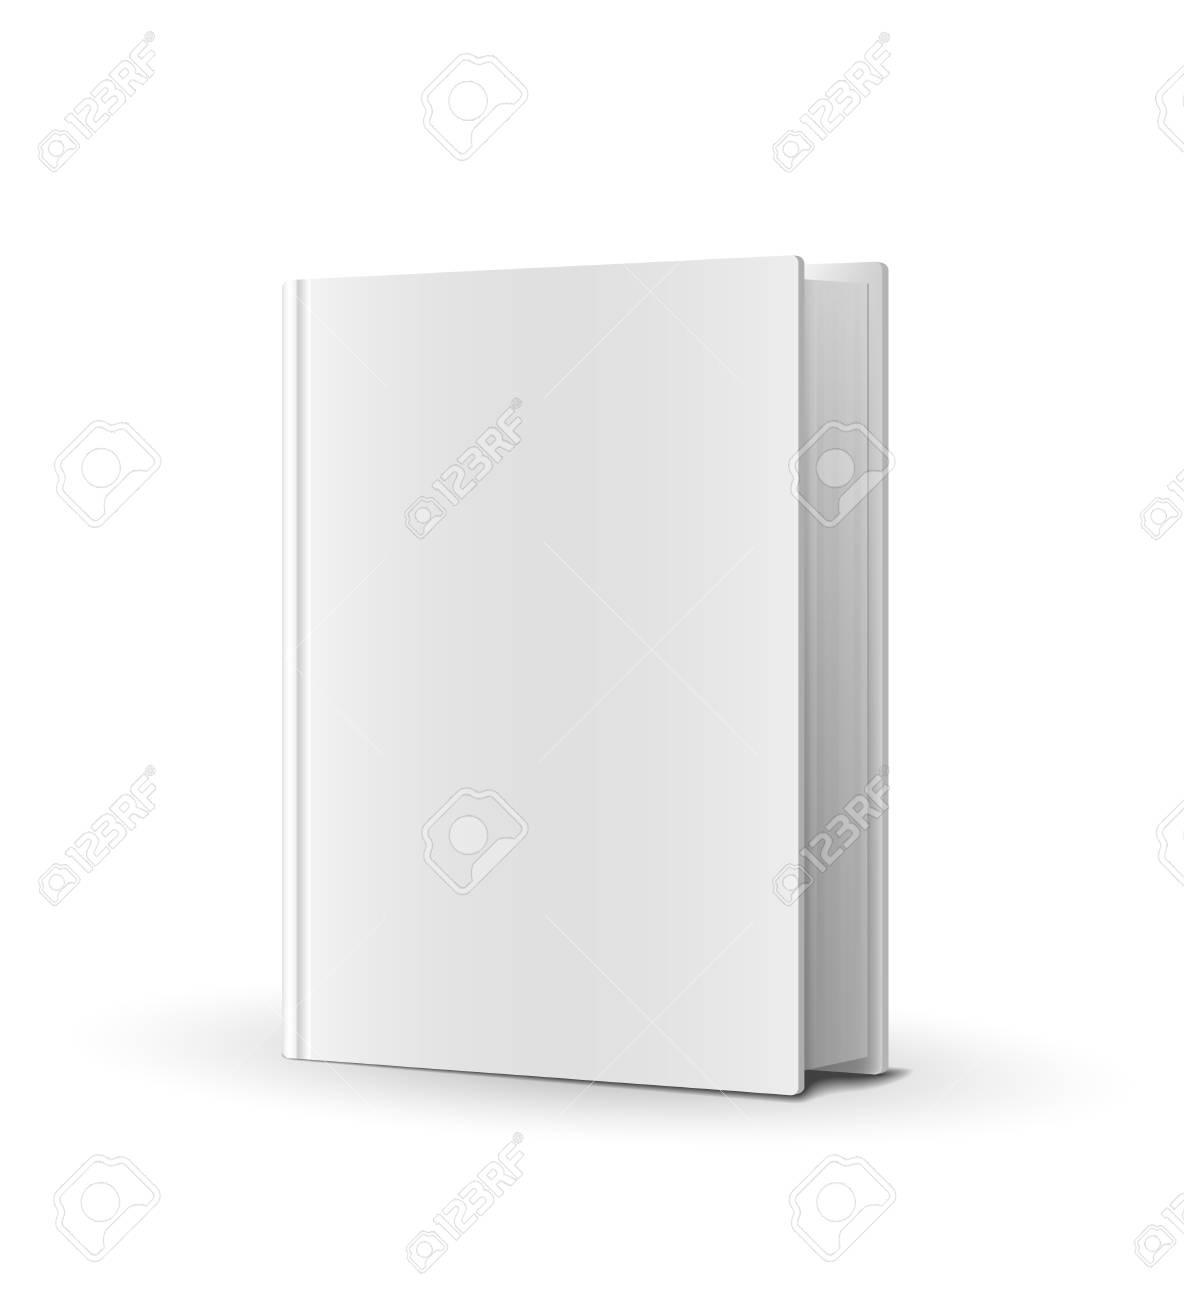 Blank book cover over white Vector Illustration Stock Vector - 22787259